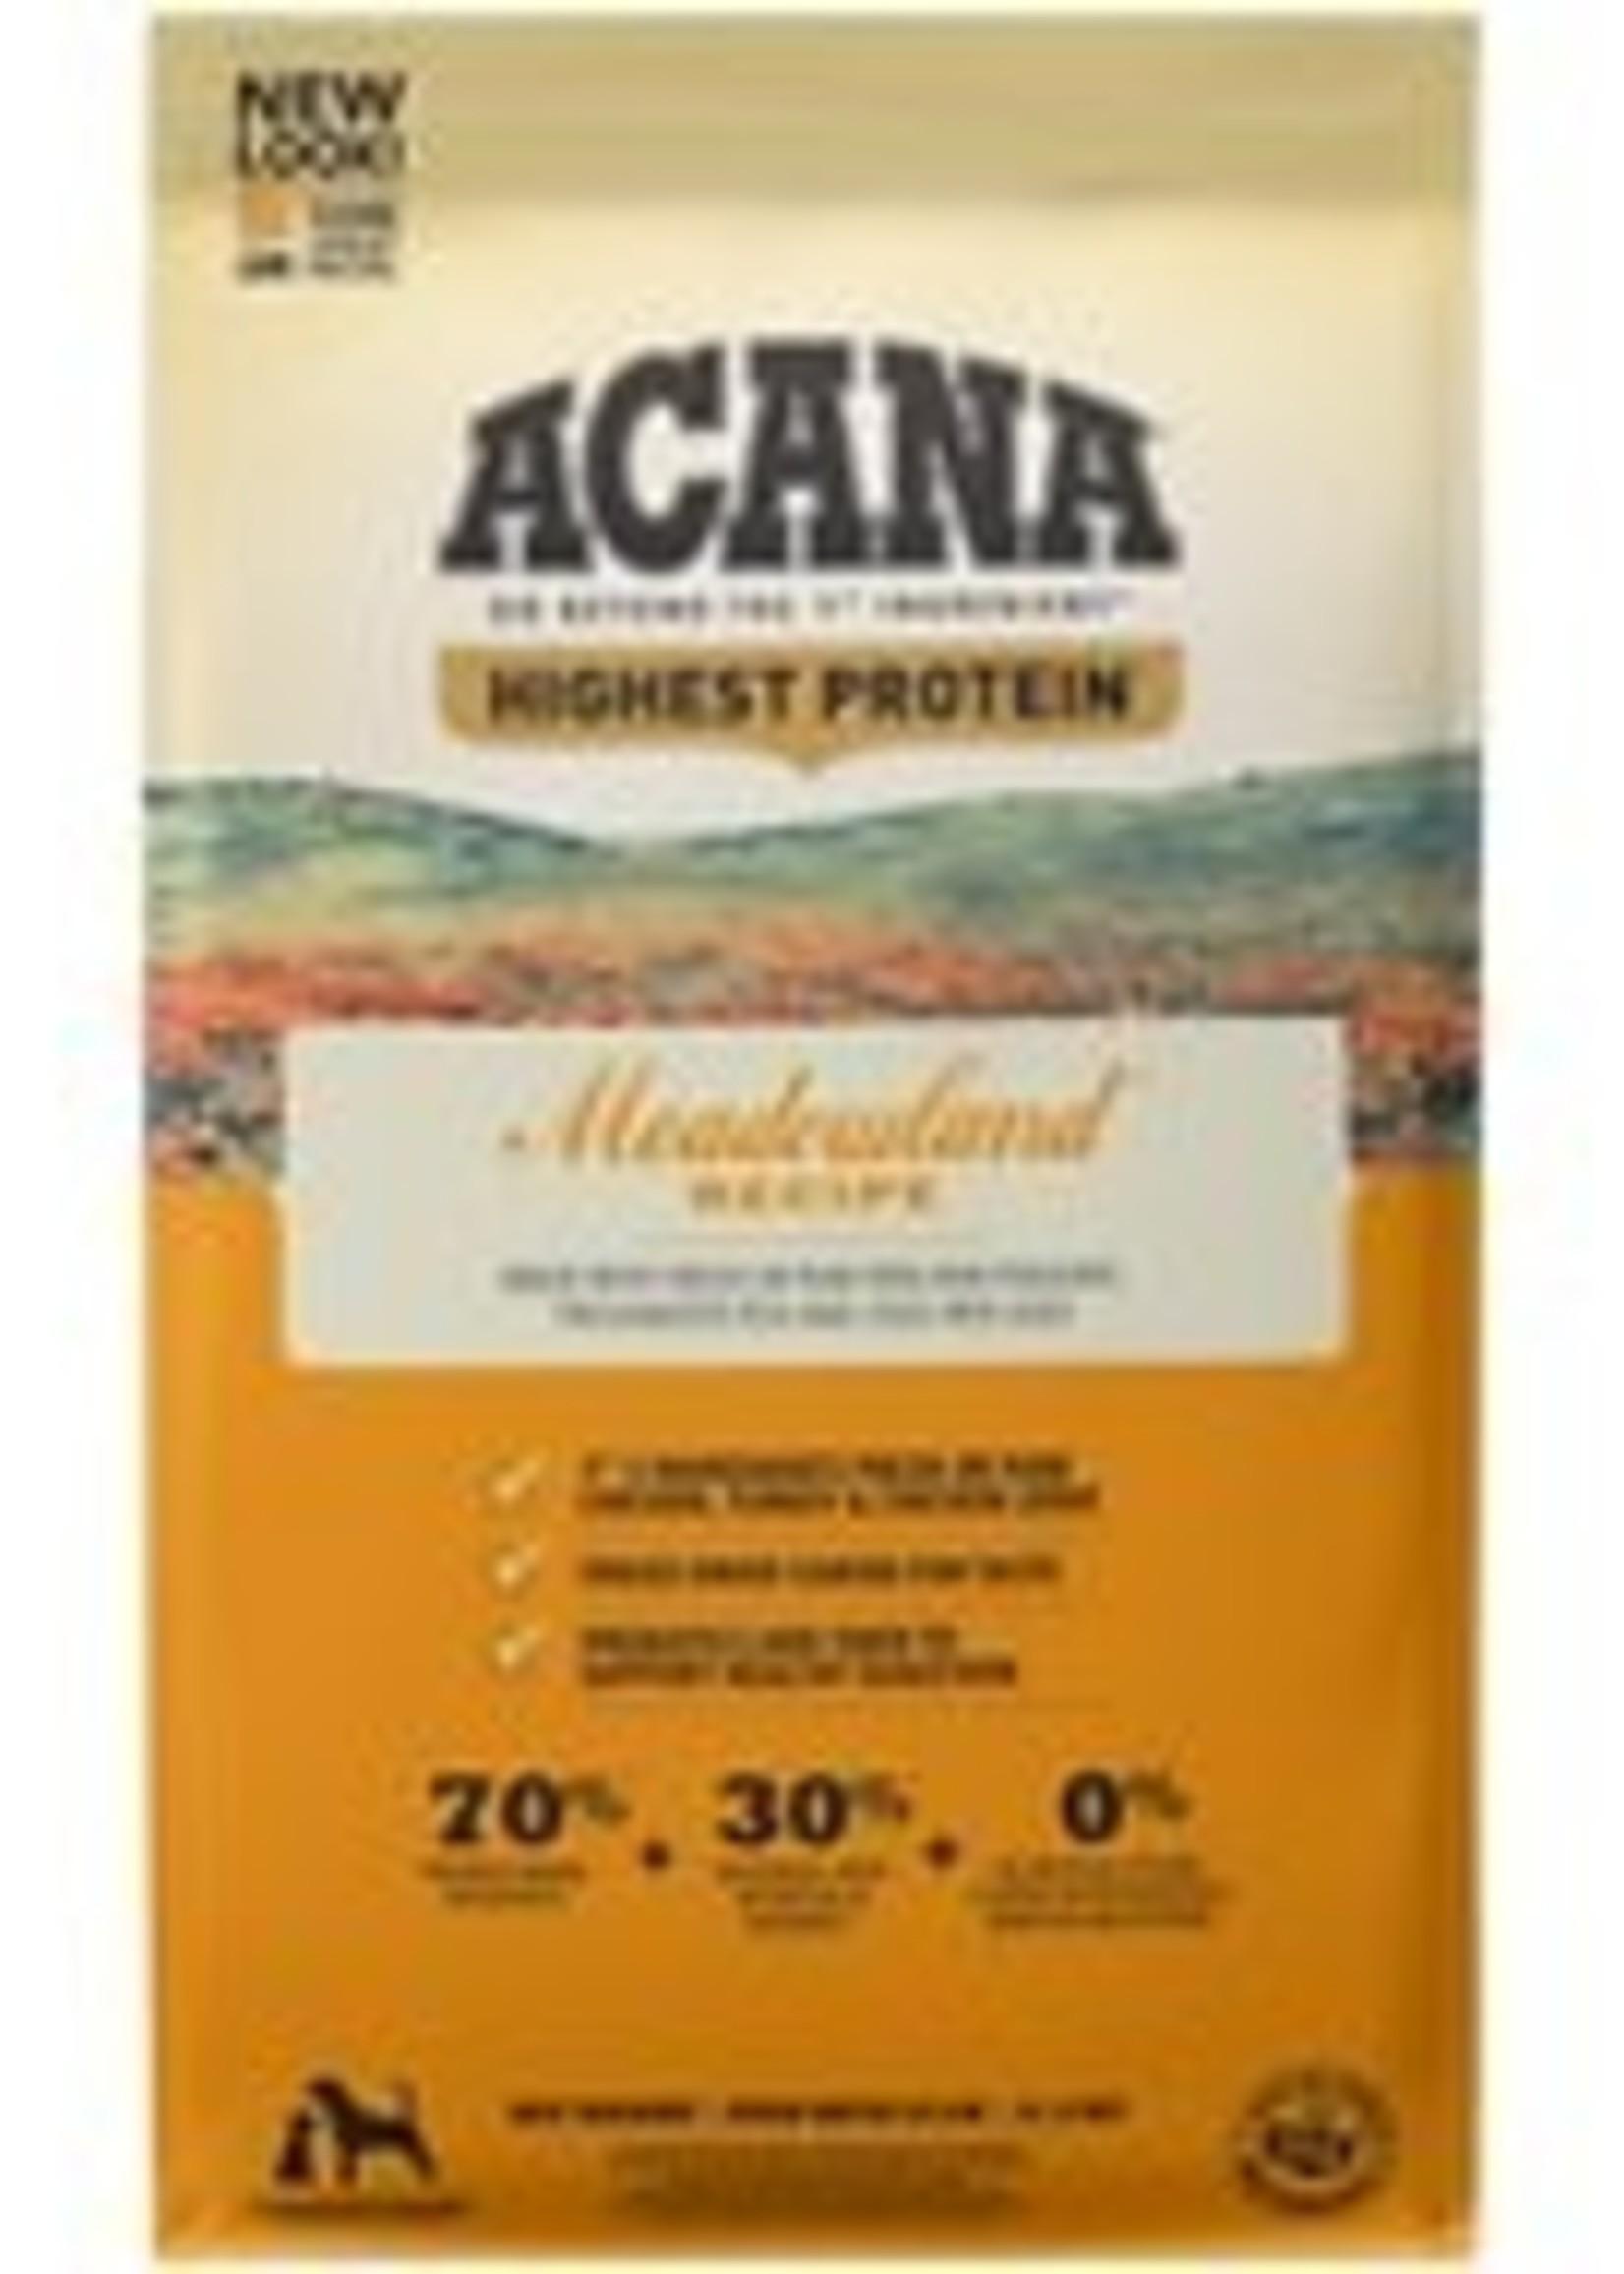 Acana Acana Meadowlands Dry Dog Food 25lb